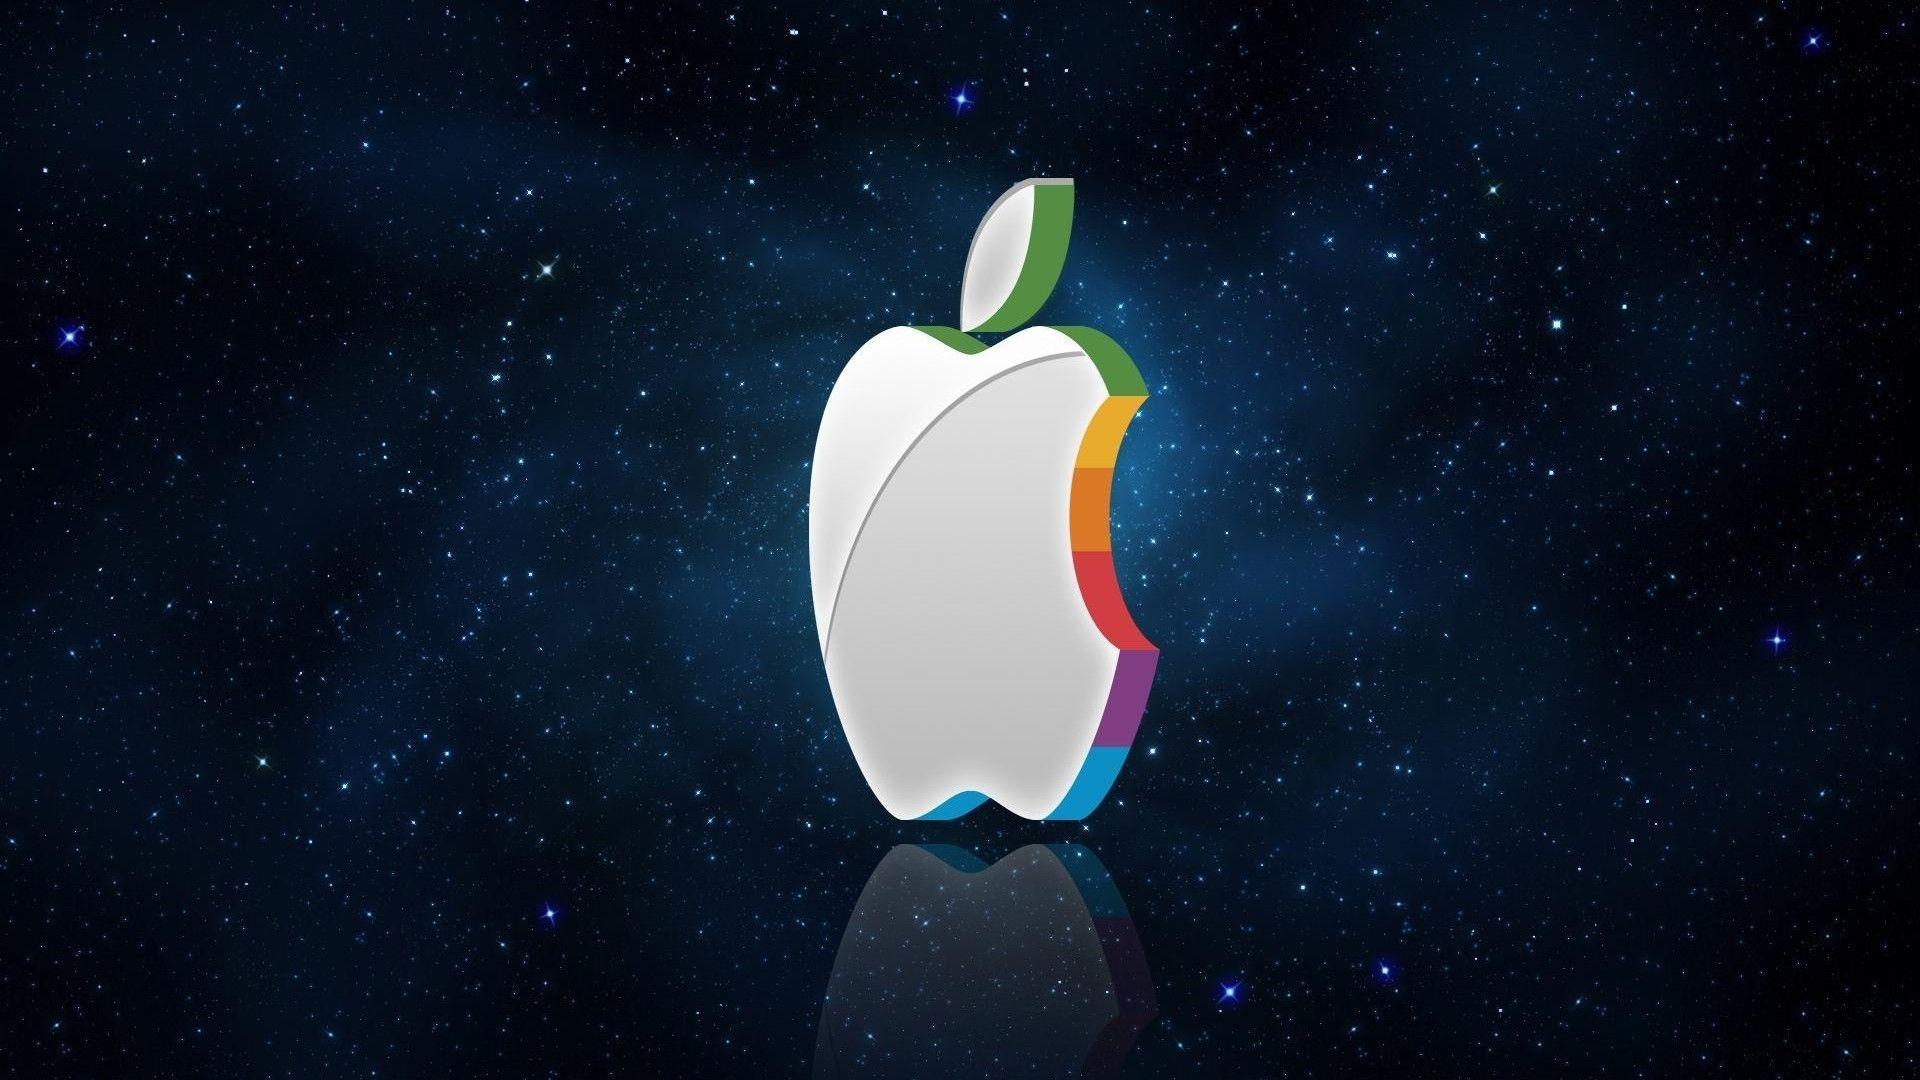 Apple Mac Desktop Wallpaper